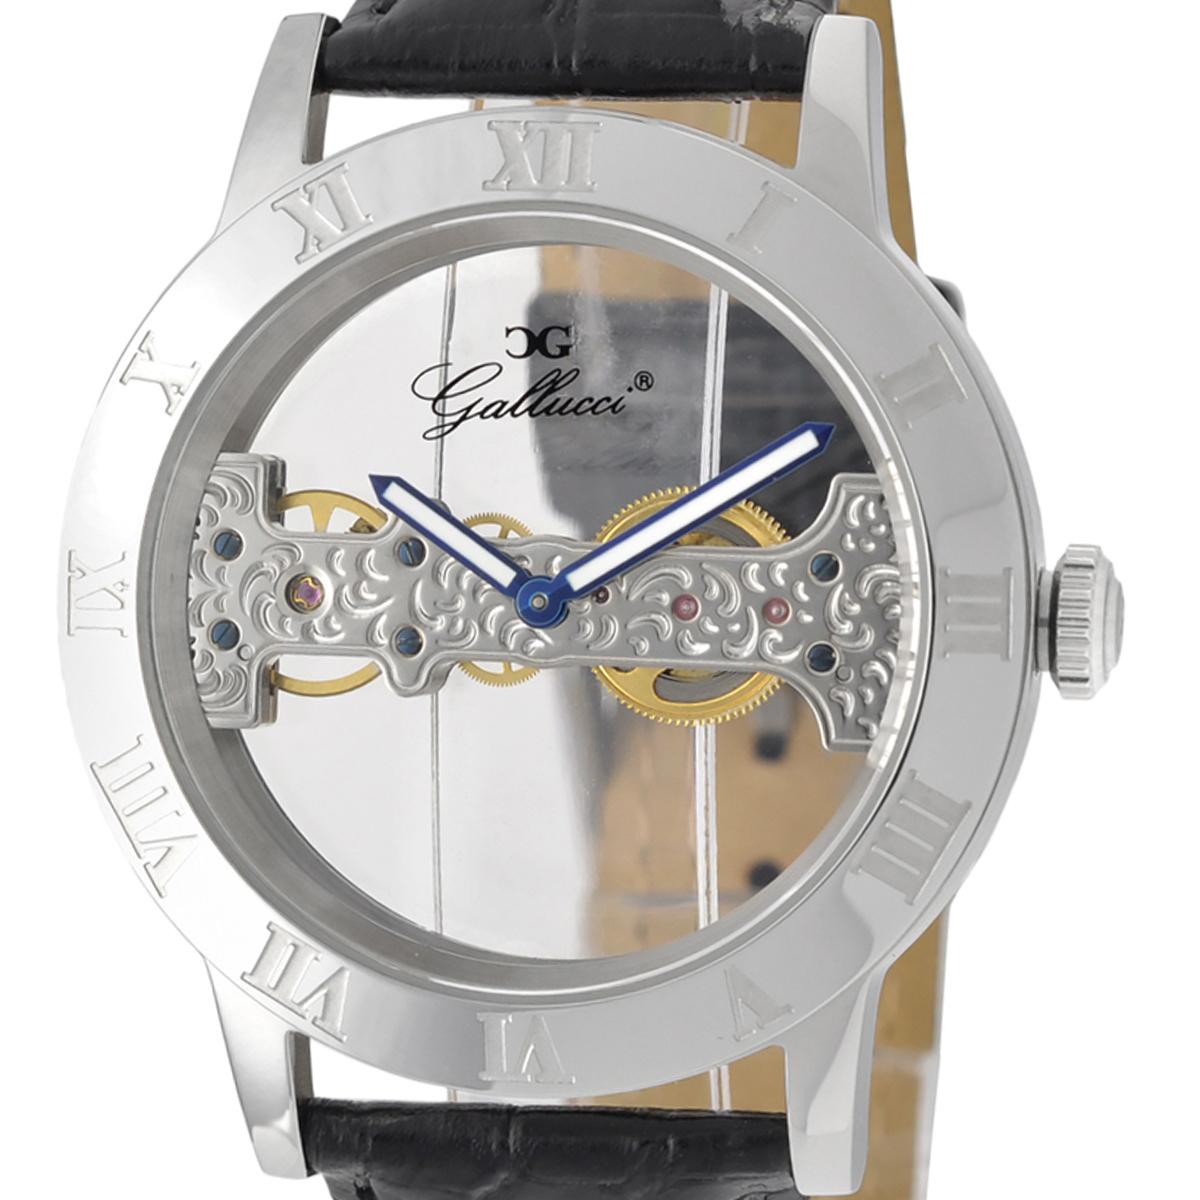 Gallucci ガルーチ 手巻き 腕時計 [WT23374SK-ST] 並行輸入品